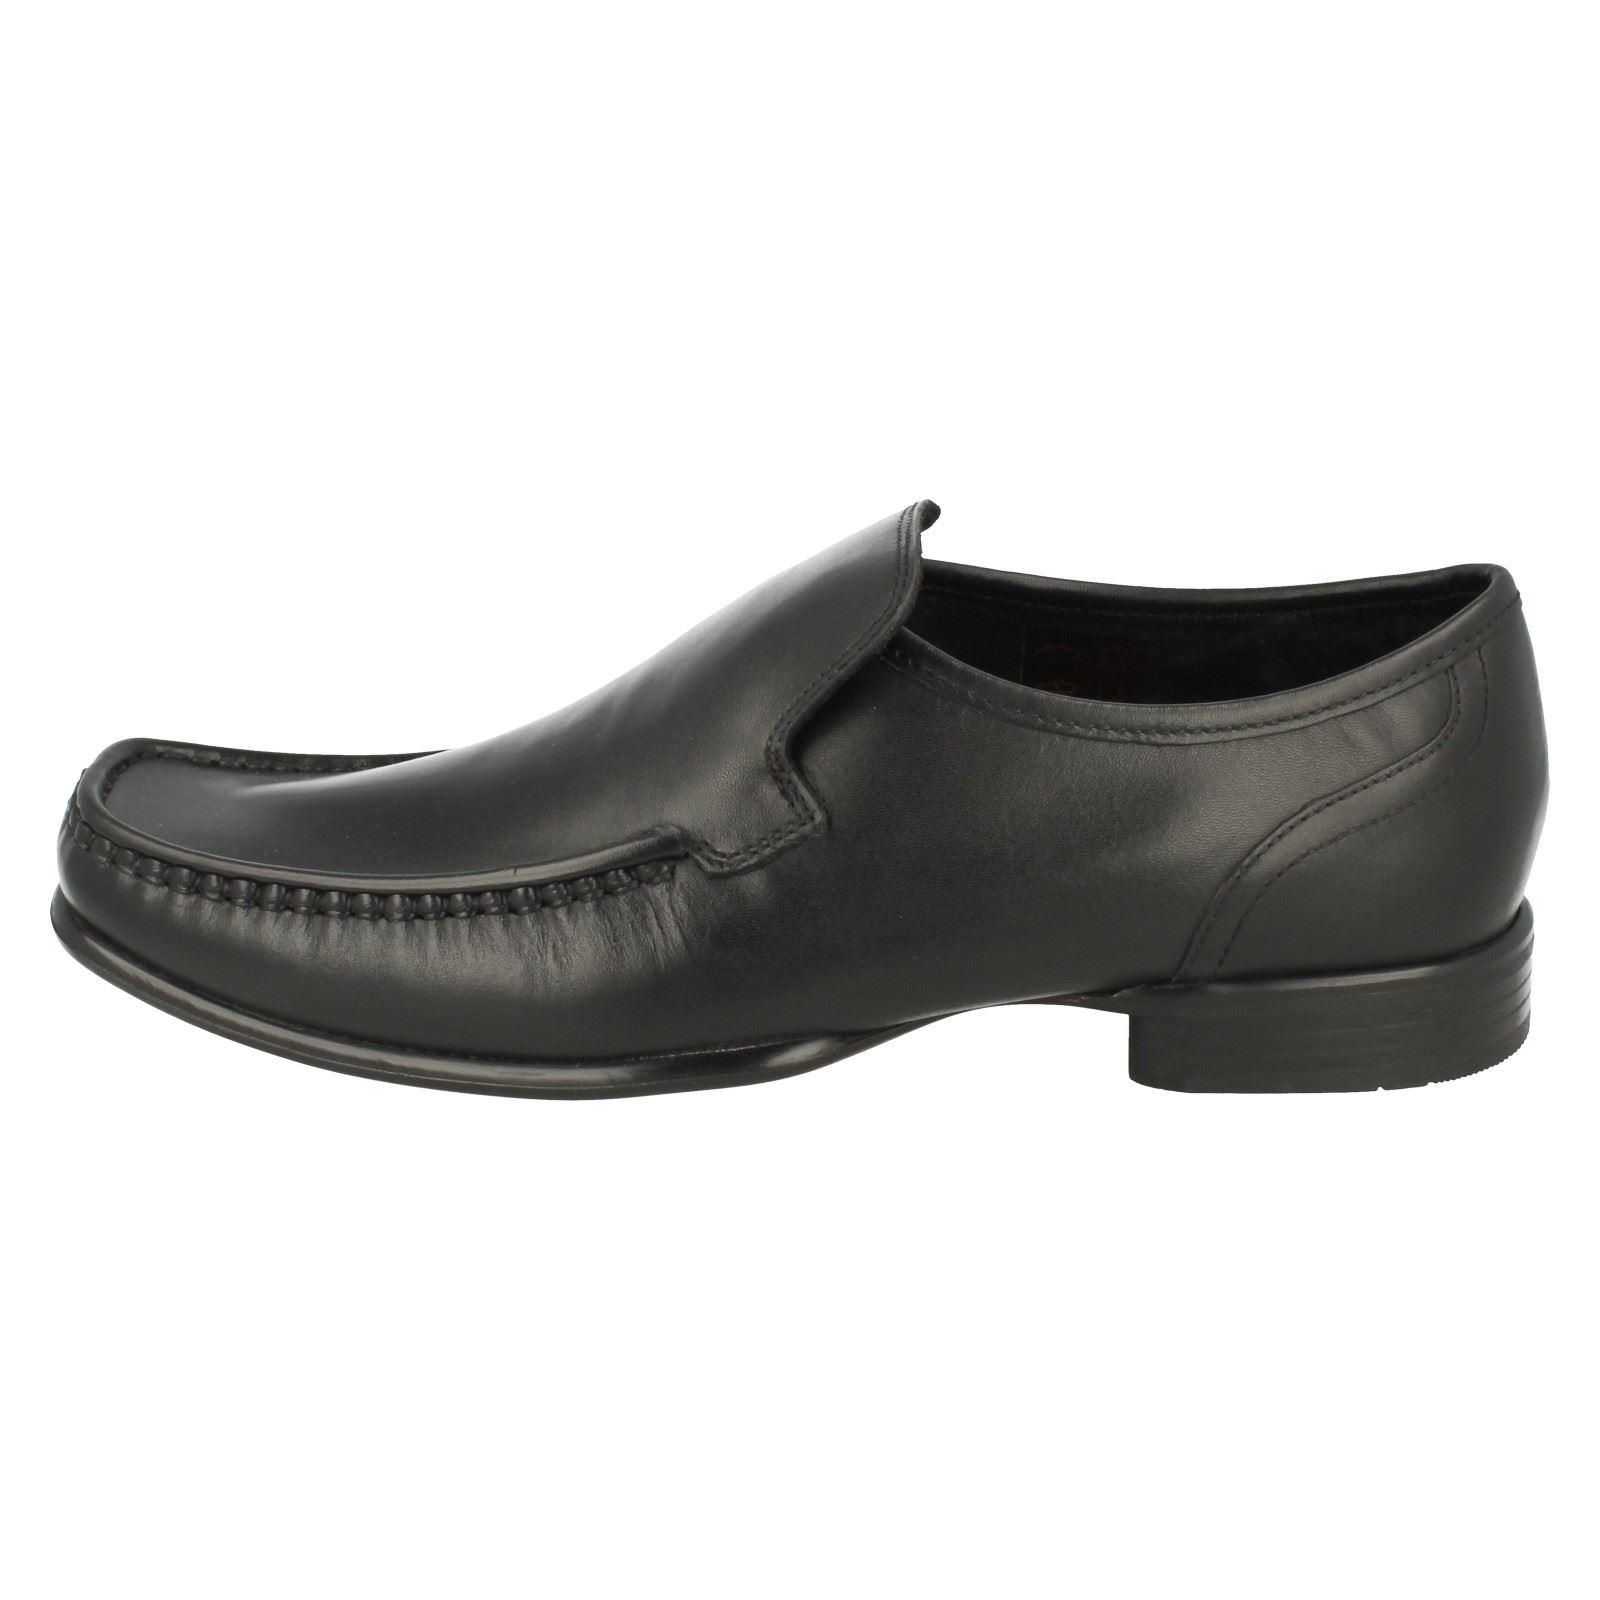 Herrenschuhe Kleidung & Accessoires Mens Ikon Slip On Moccasin Shoes Argent